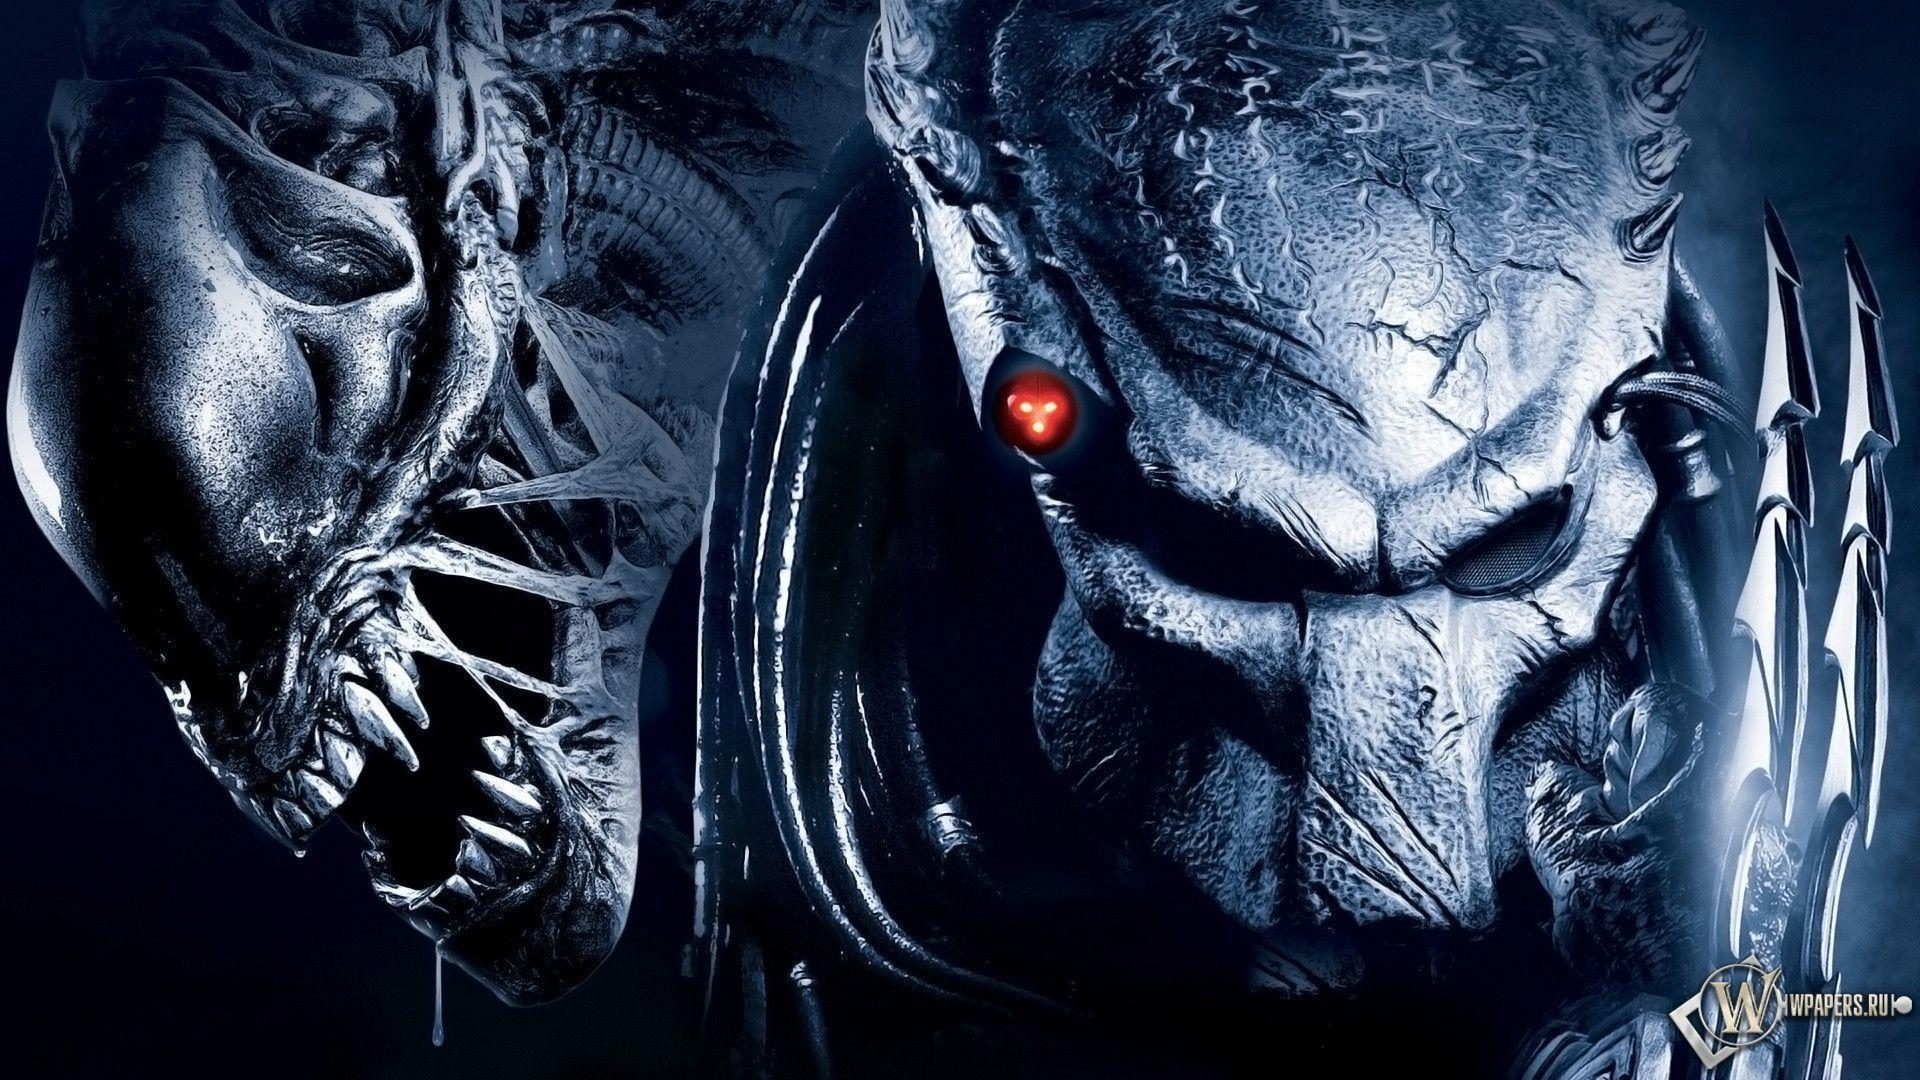 Monsters vs alliens pord download porn image